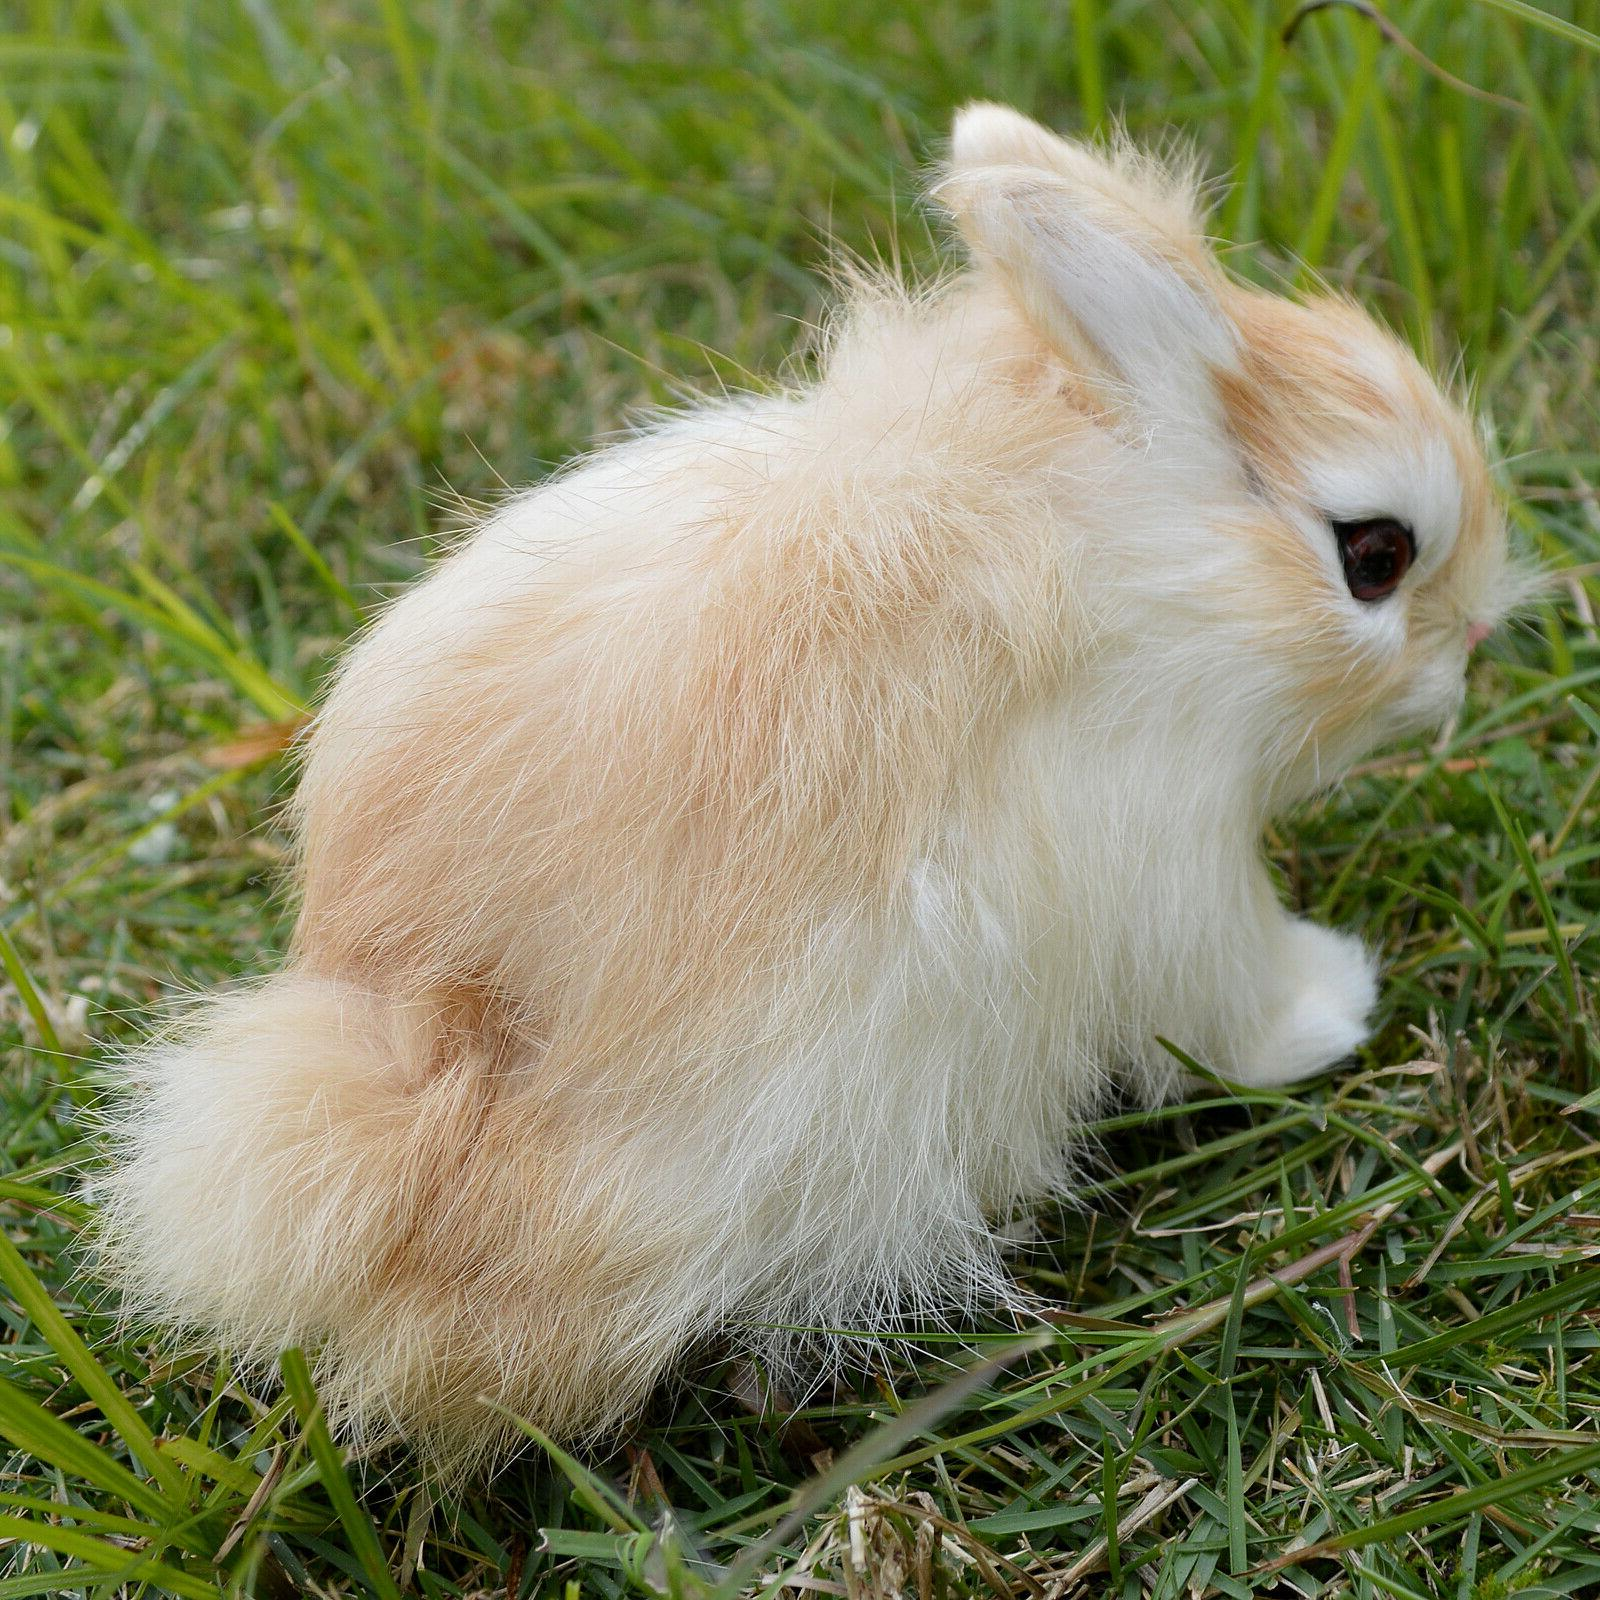 Realistic Handmade Easter Bunny Holiday Photo